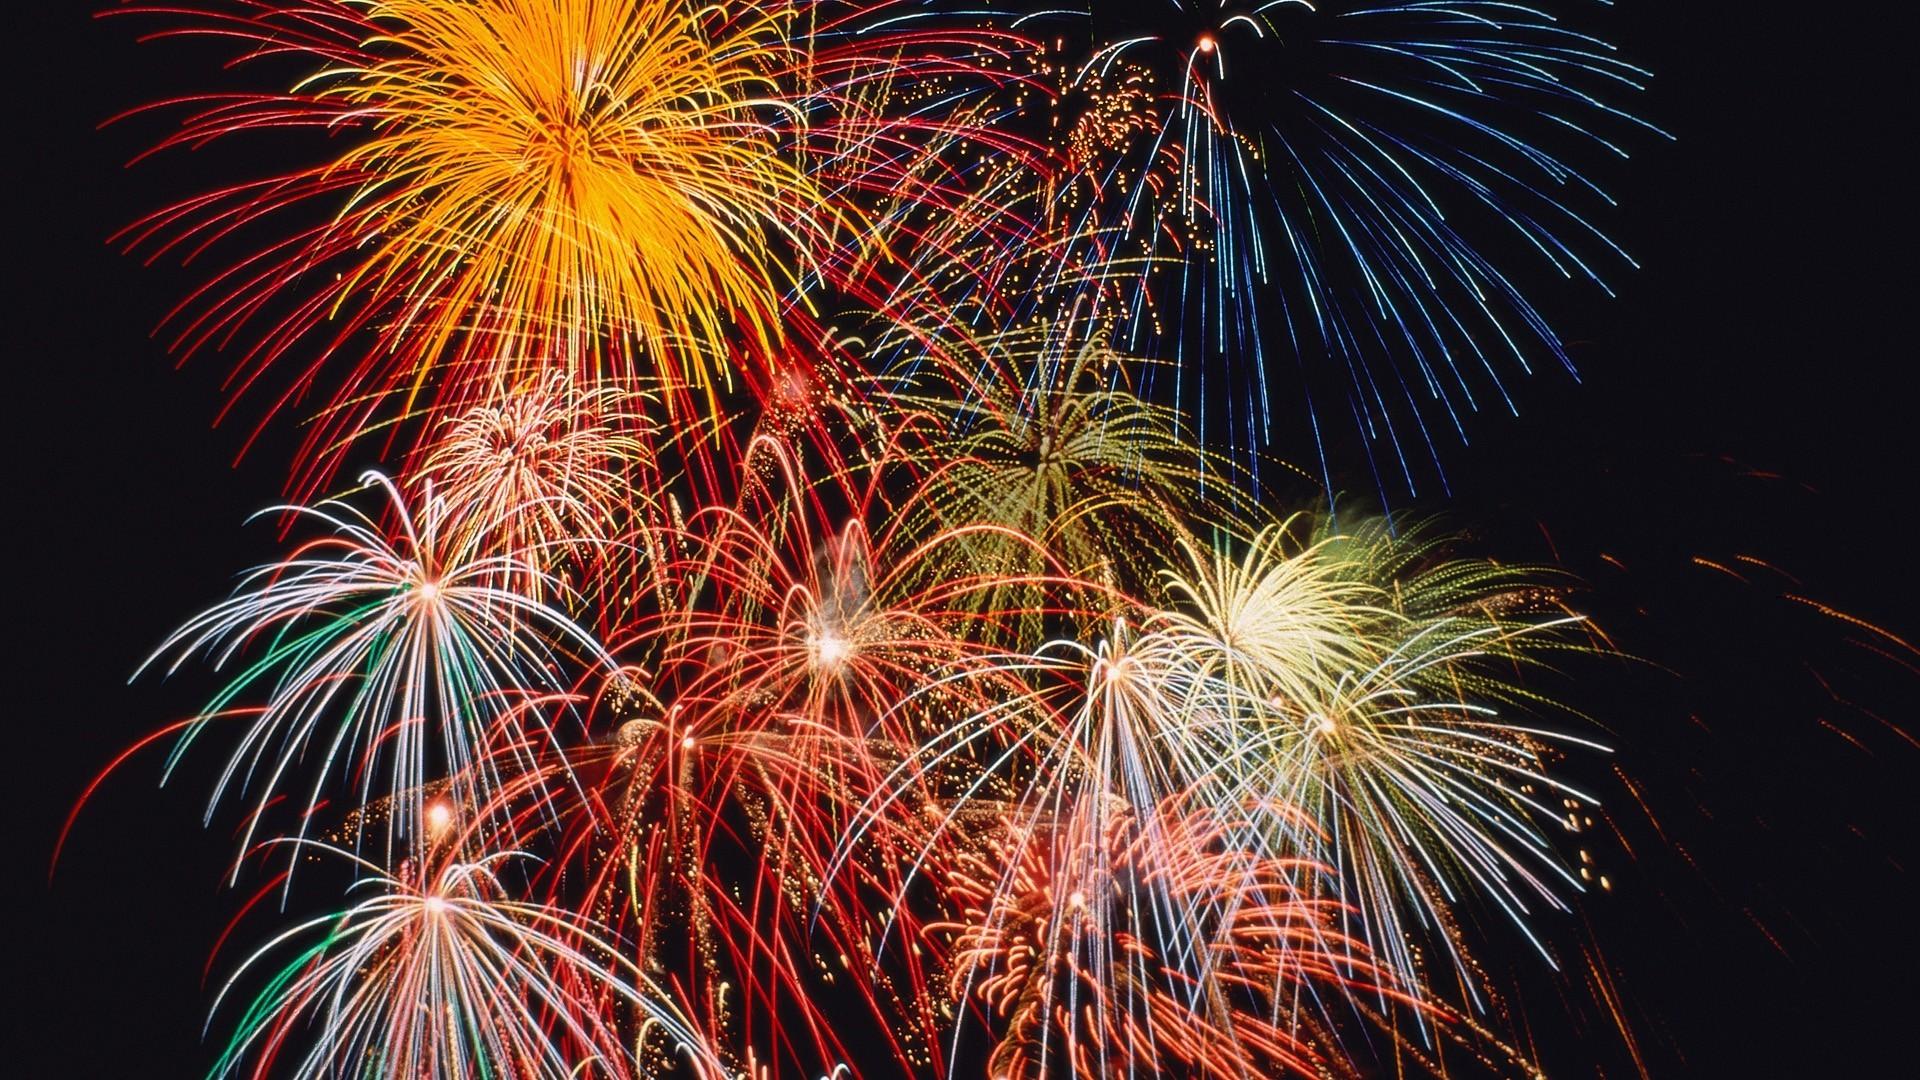 Fireworks Wallpaper Free: Fireworks Background ·① Download Free Beautiful HD